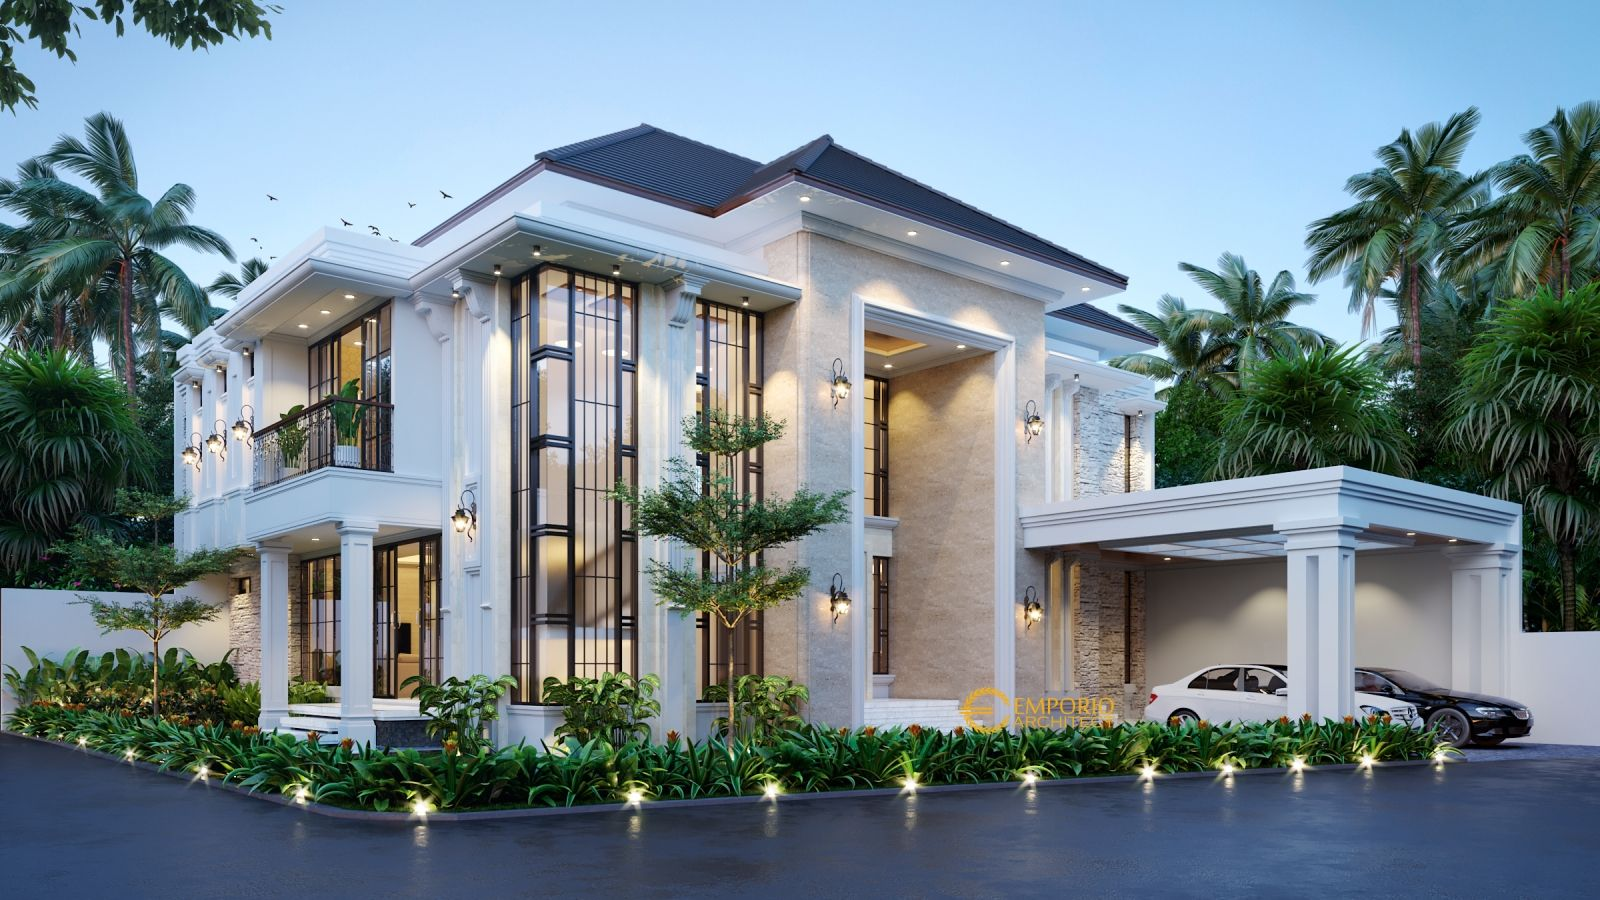 Desain Rumah Mewah Clasic Modern Cek Bahan Bangunan